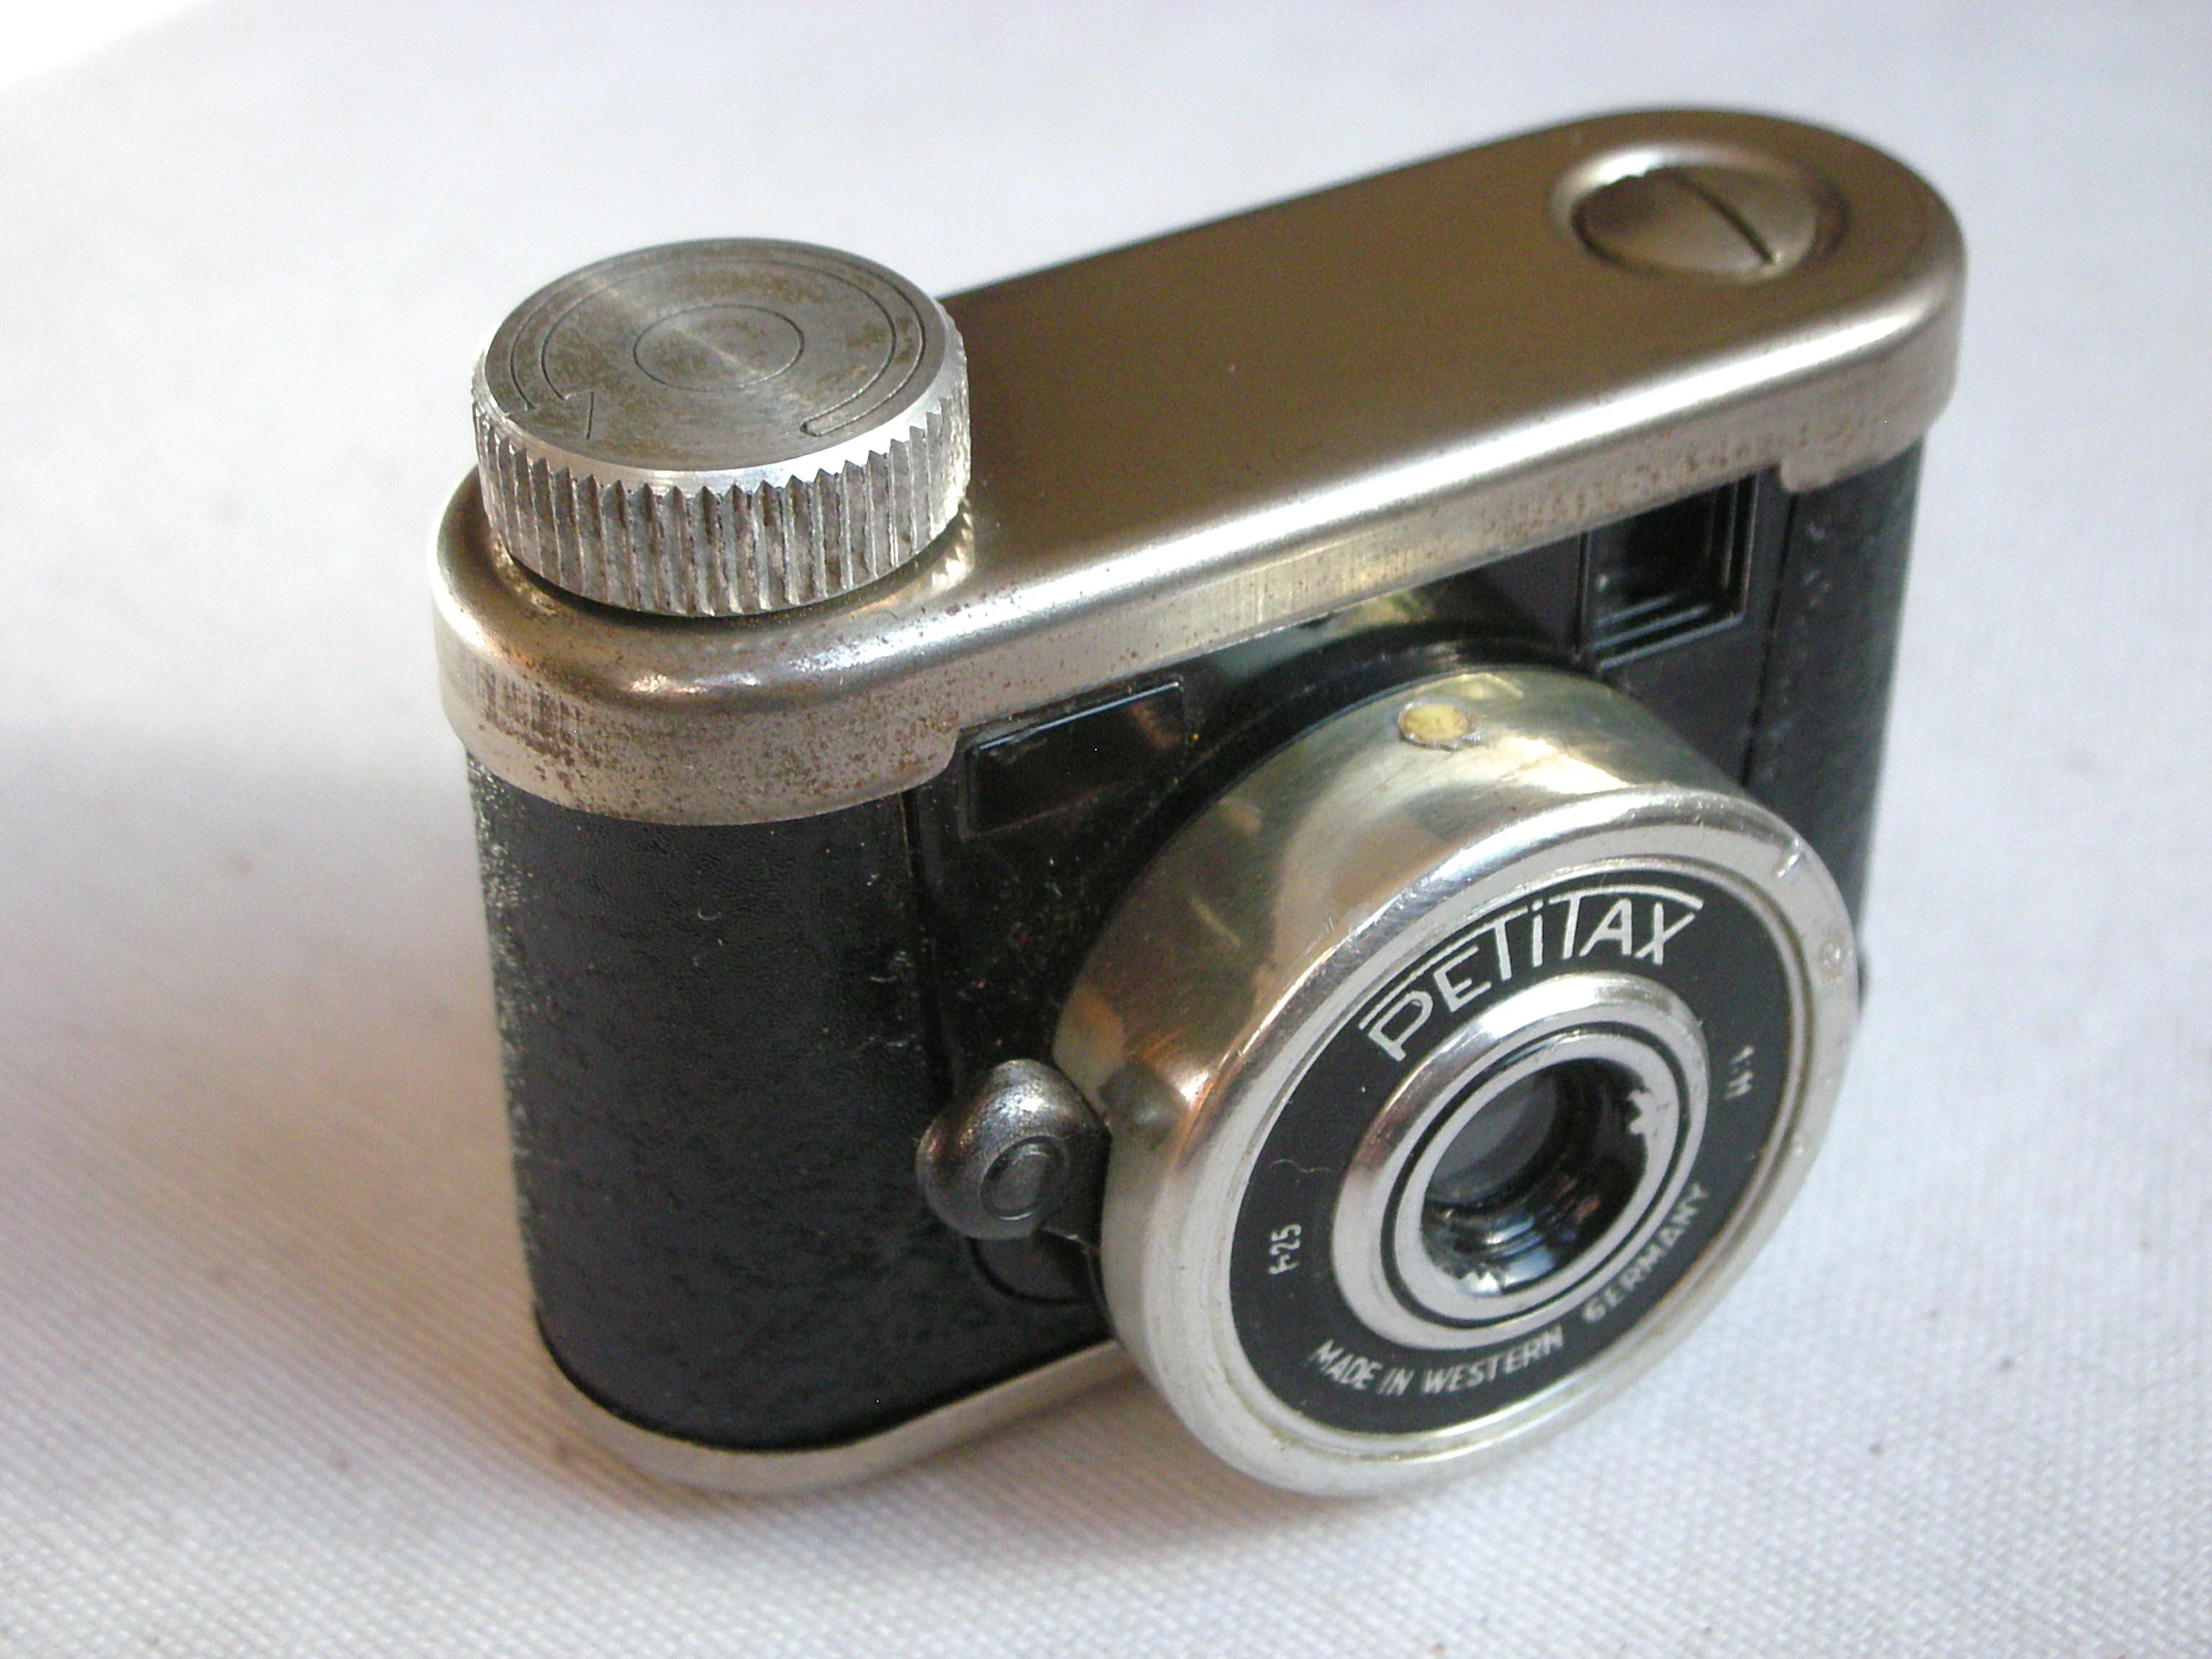 kunik petitax camera joops camera collection. Black Bedroom Furniture Sets. Home Design Ideas